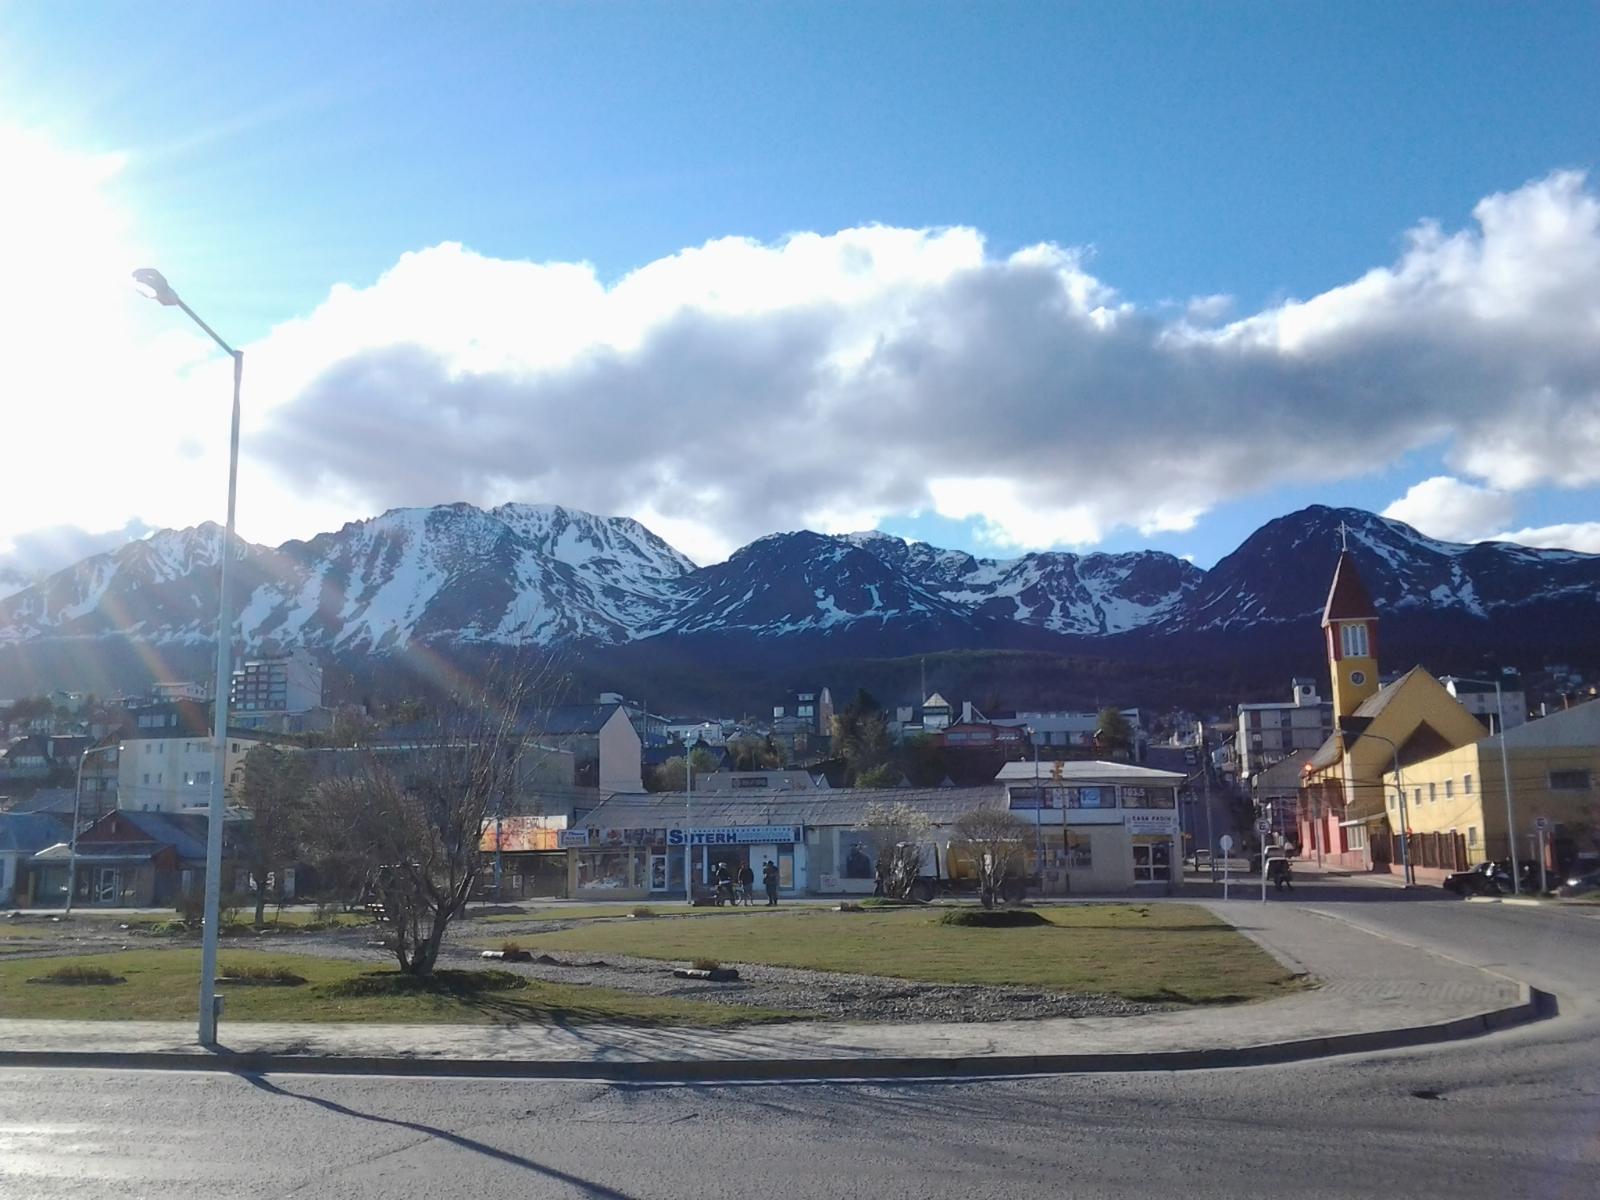 Se vino el verano: pronostican máxima de 20 grados para Ushuaia - Infofueguina